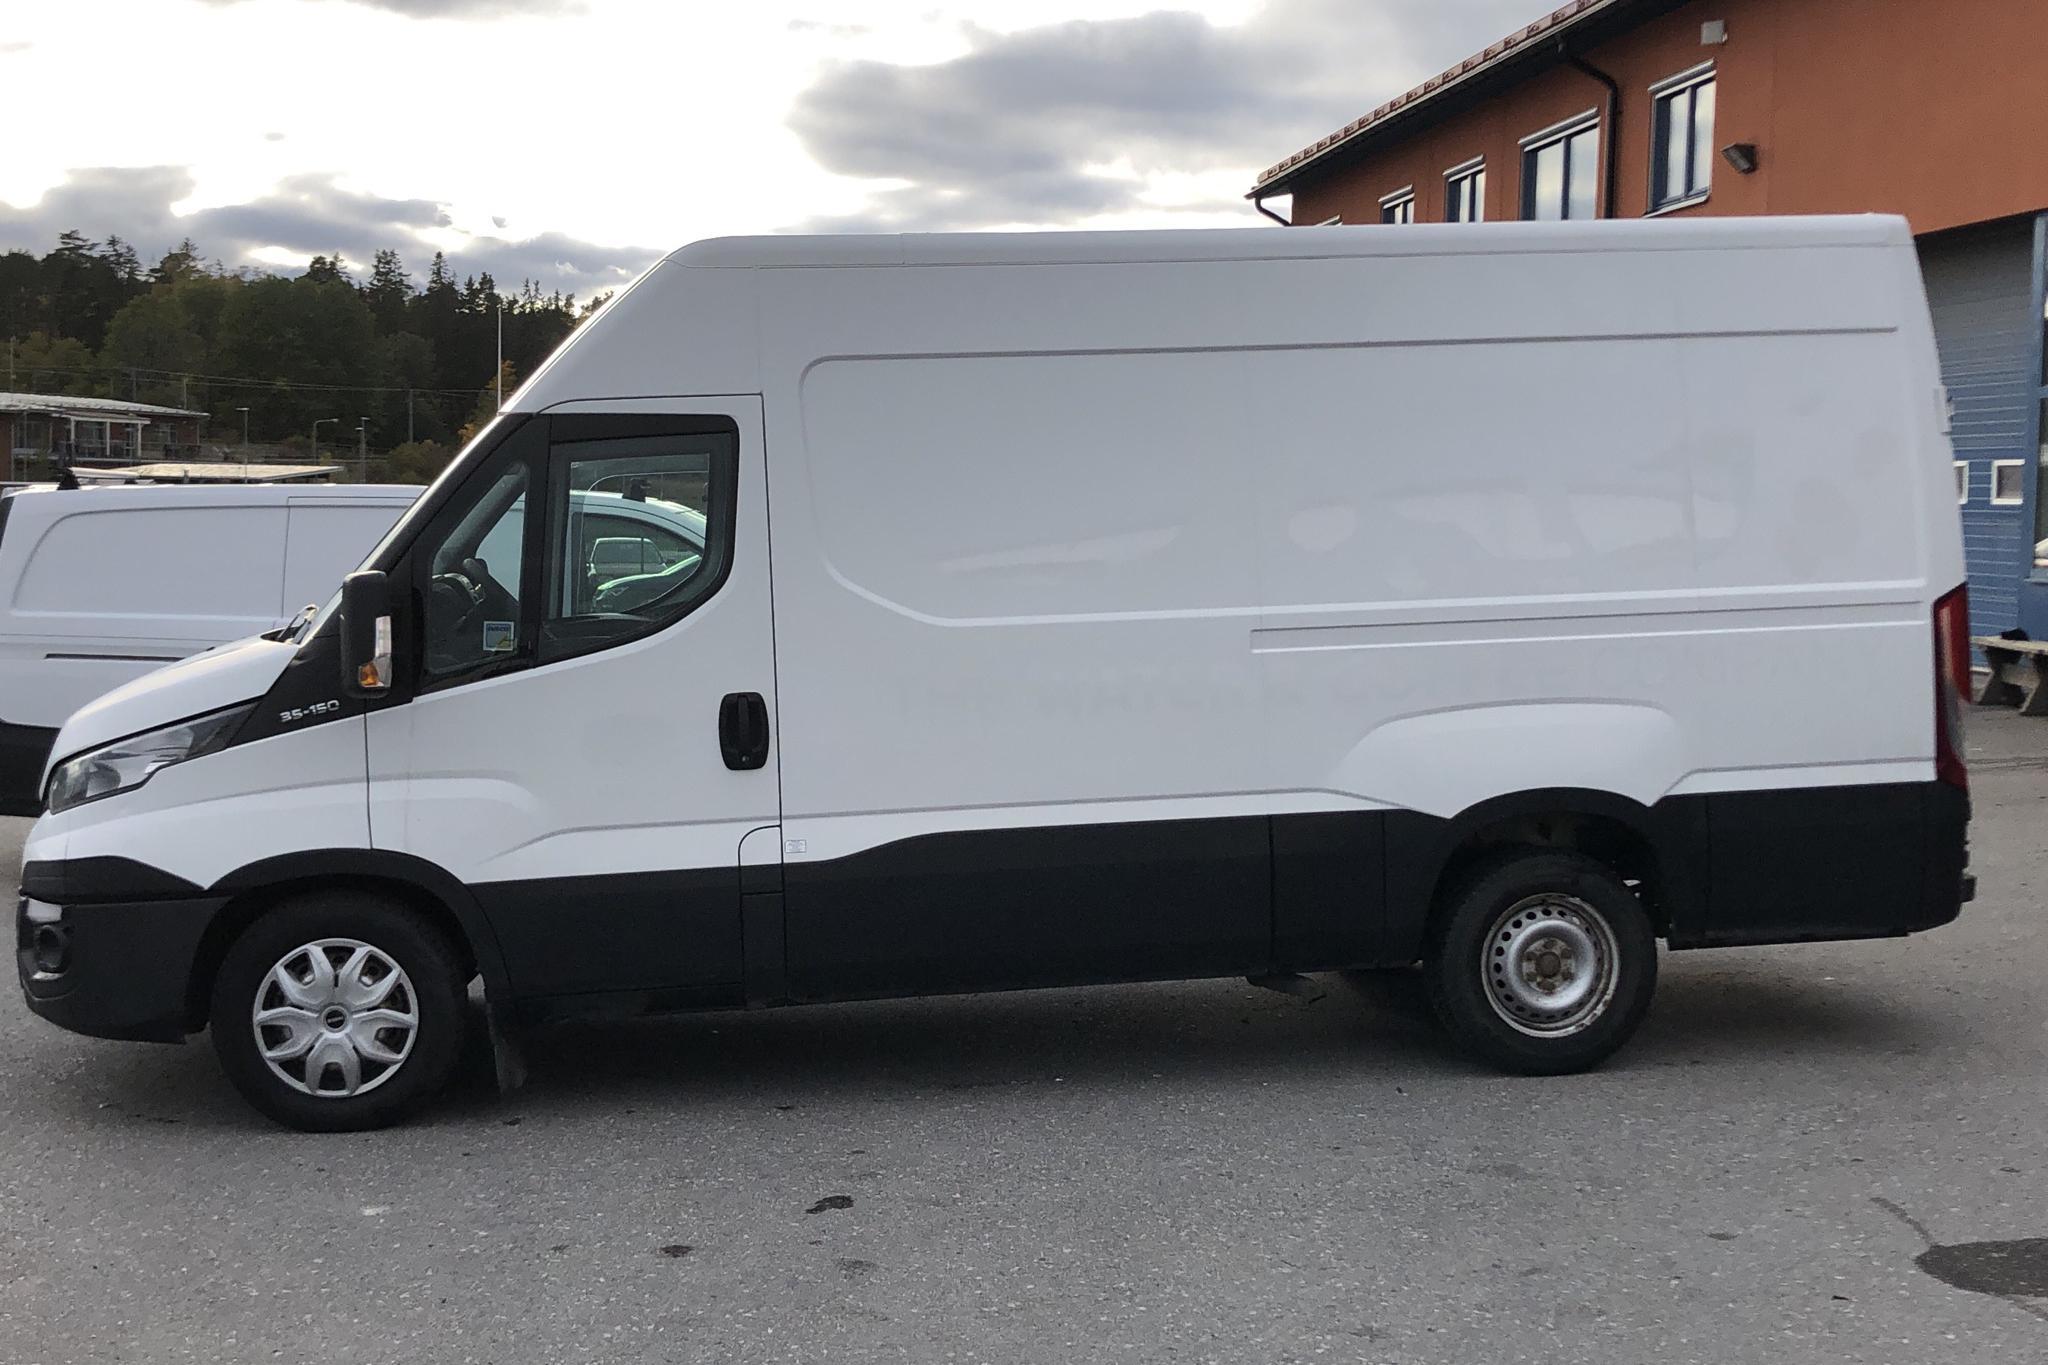 Iveco Daily 35 2.3 (146hk) - 200 000 km - Manual - white - 0